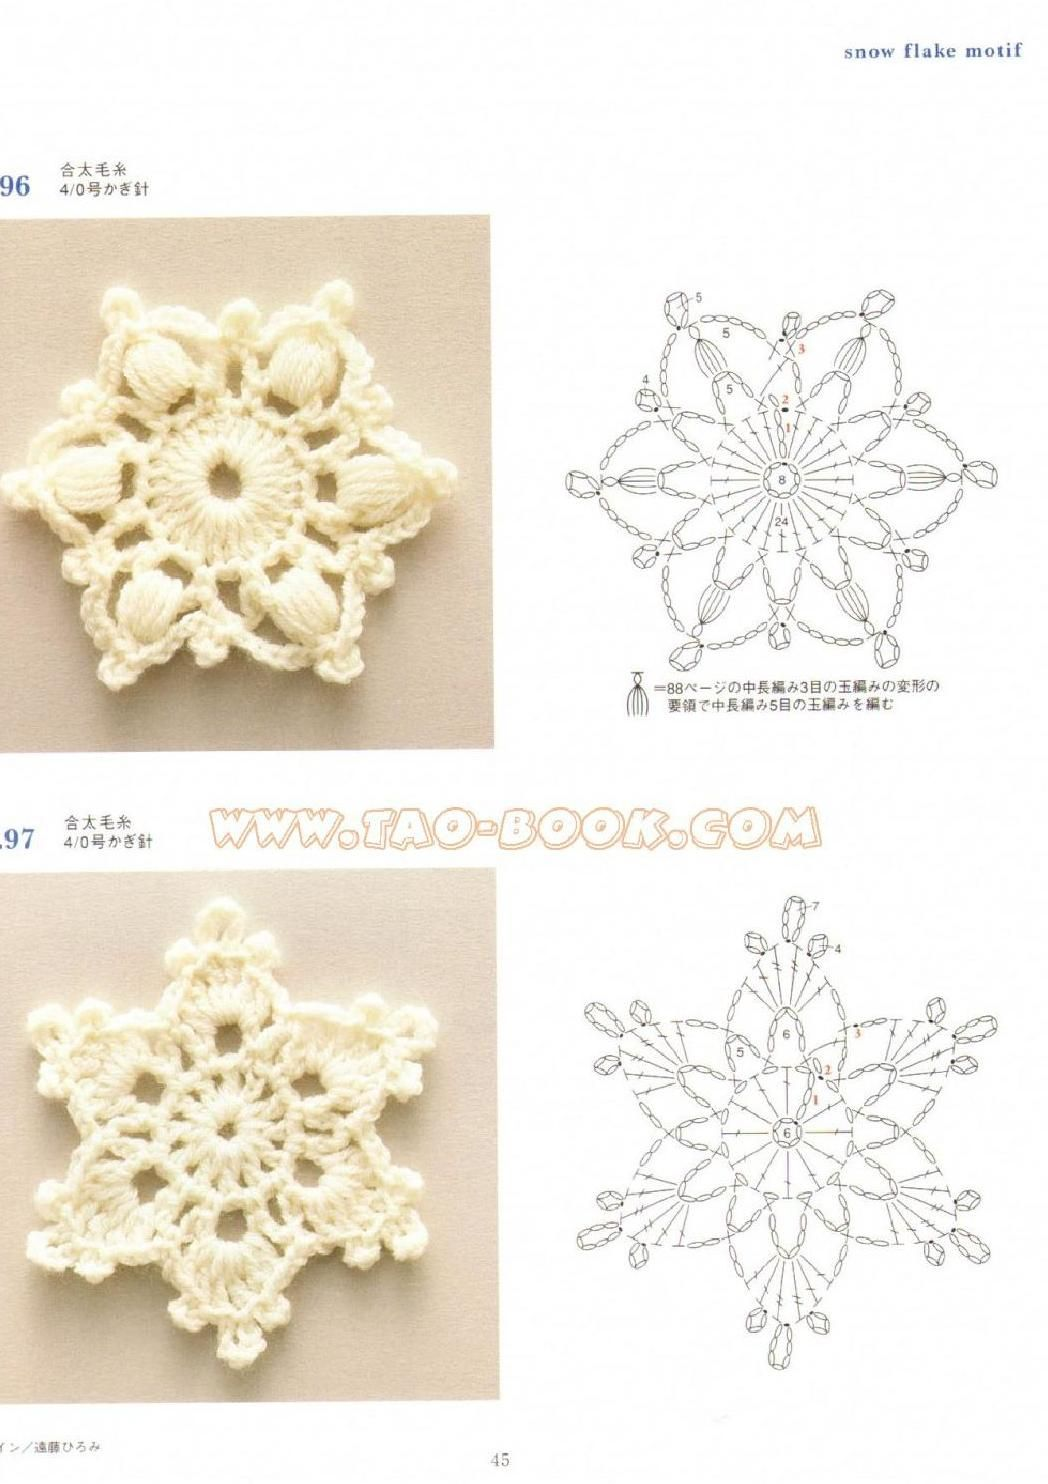 Ondori motif and edging designs #crochetmotif